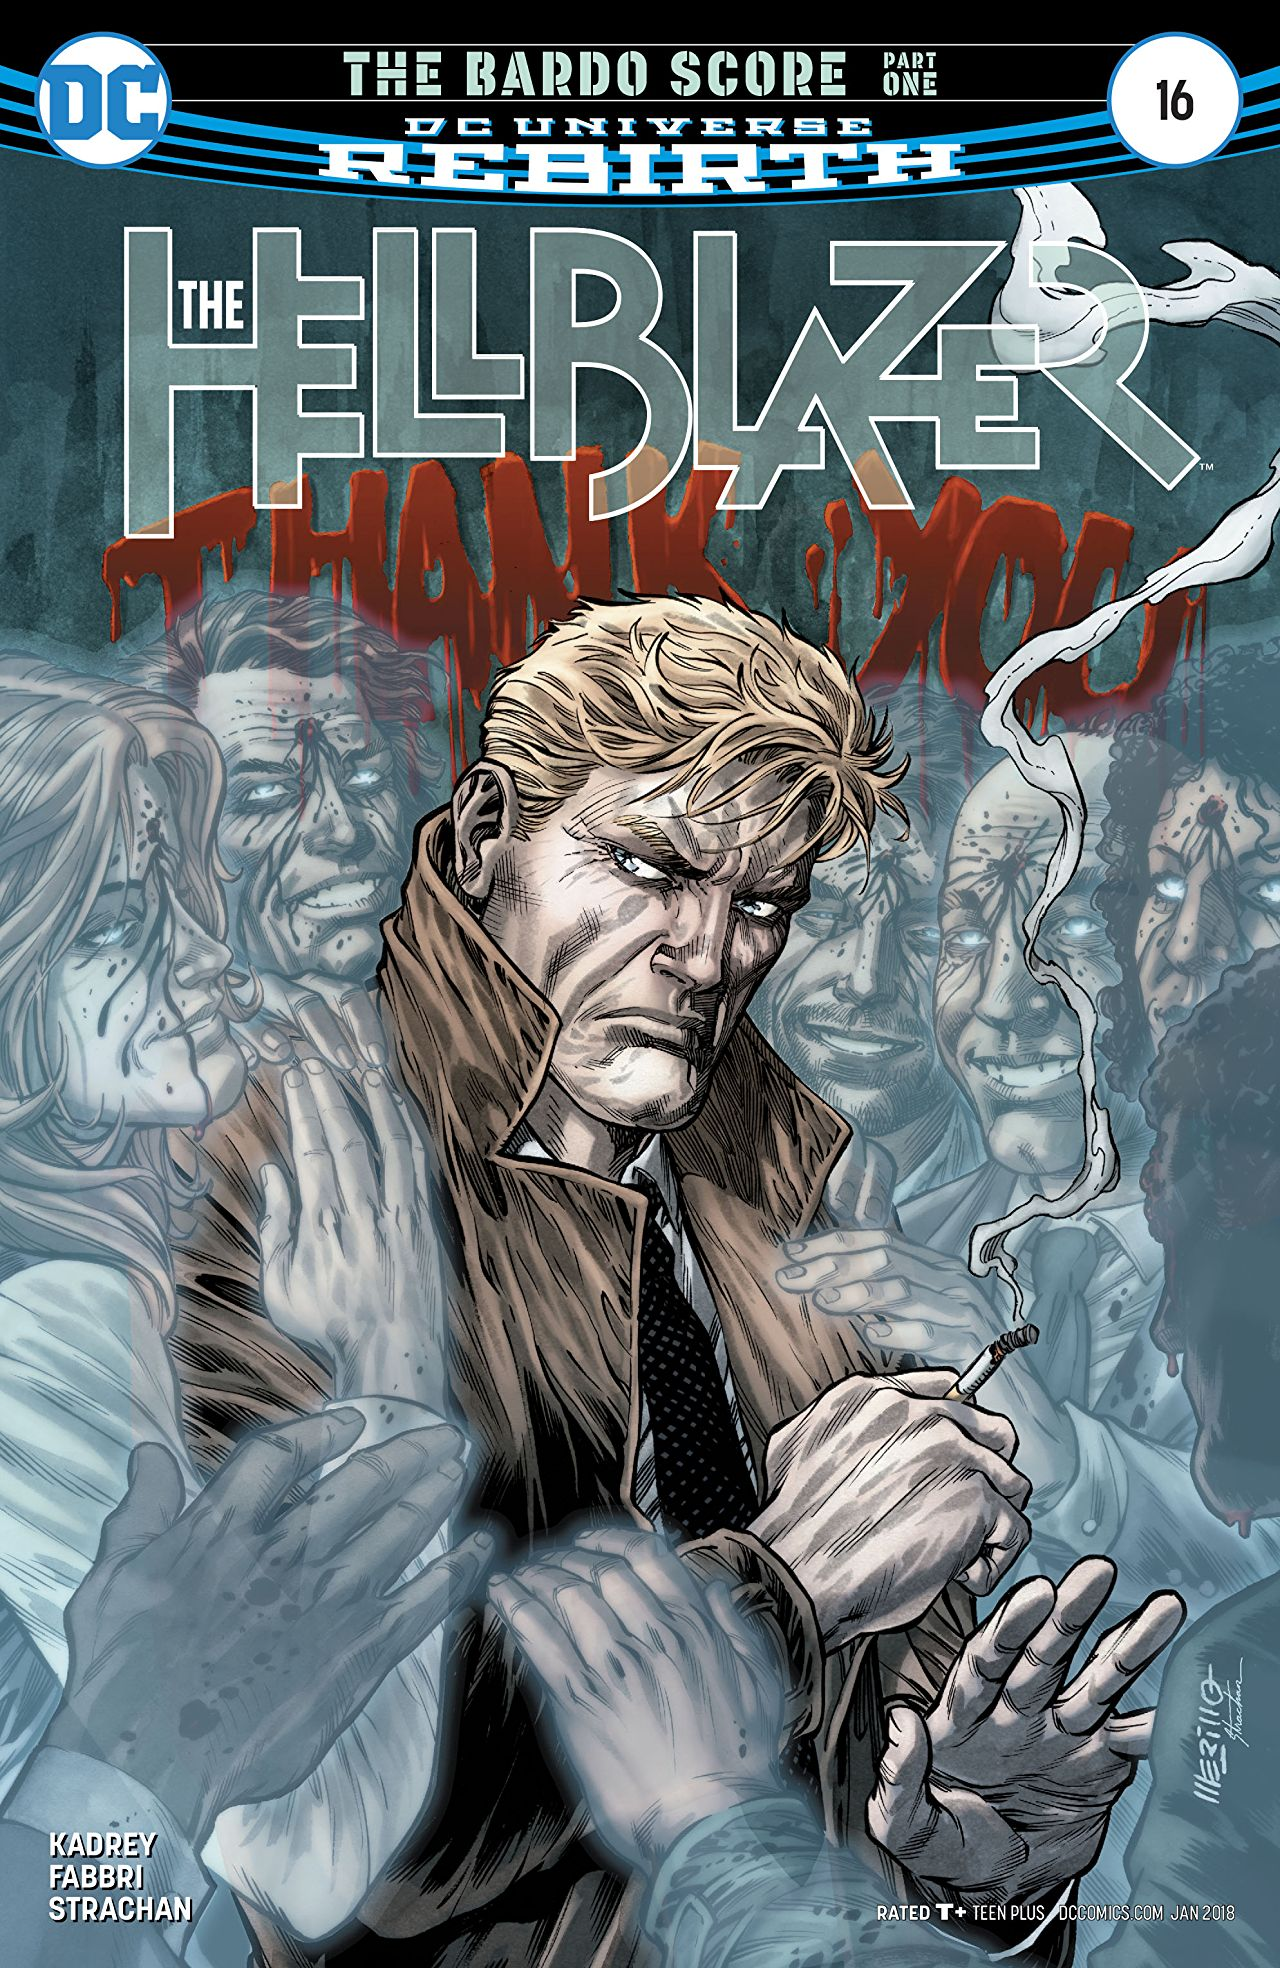 The Hellblazer Vol 1 16.jpg